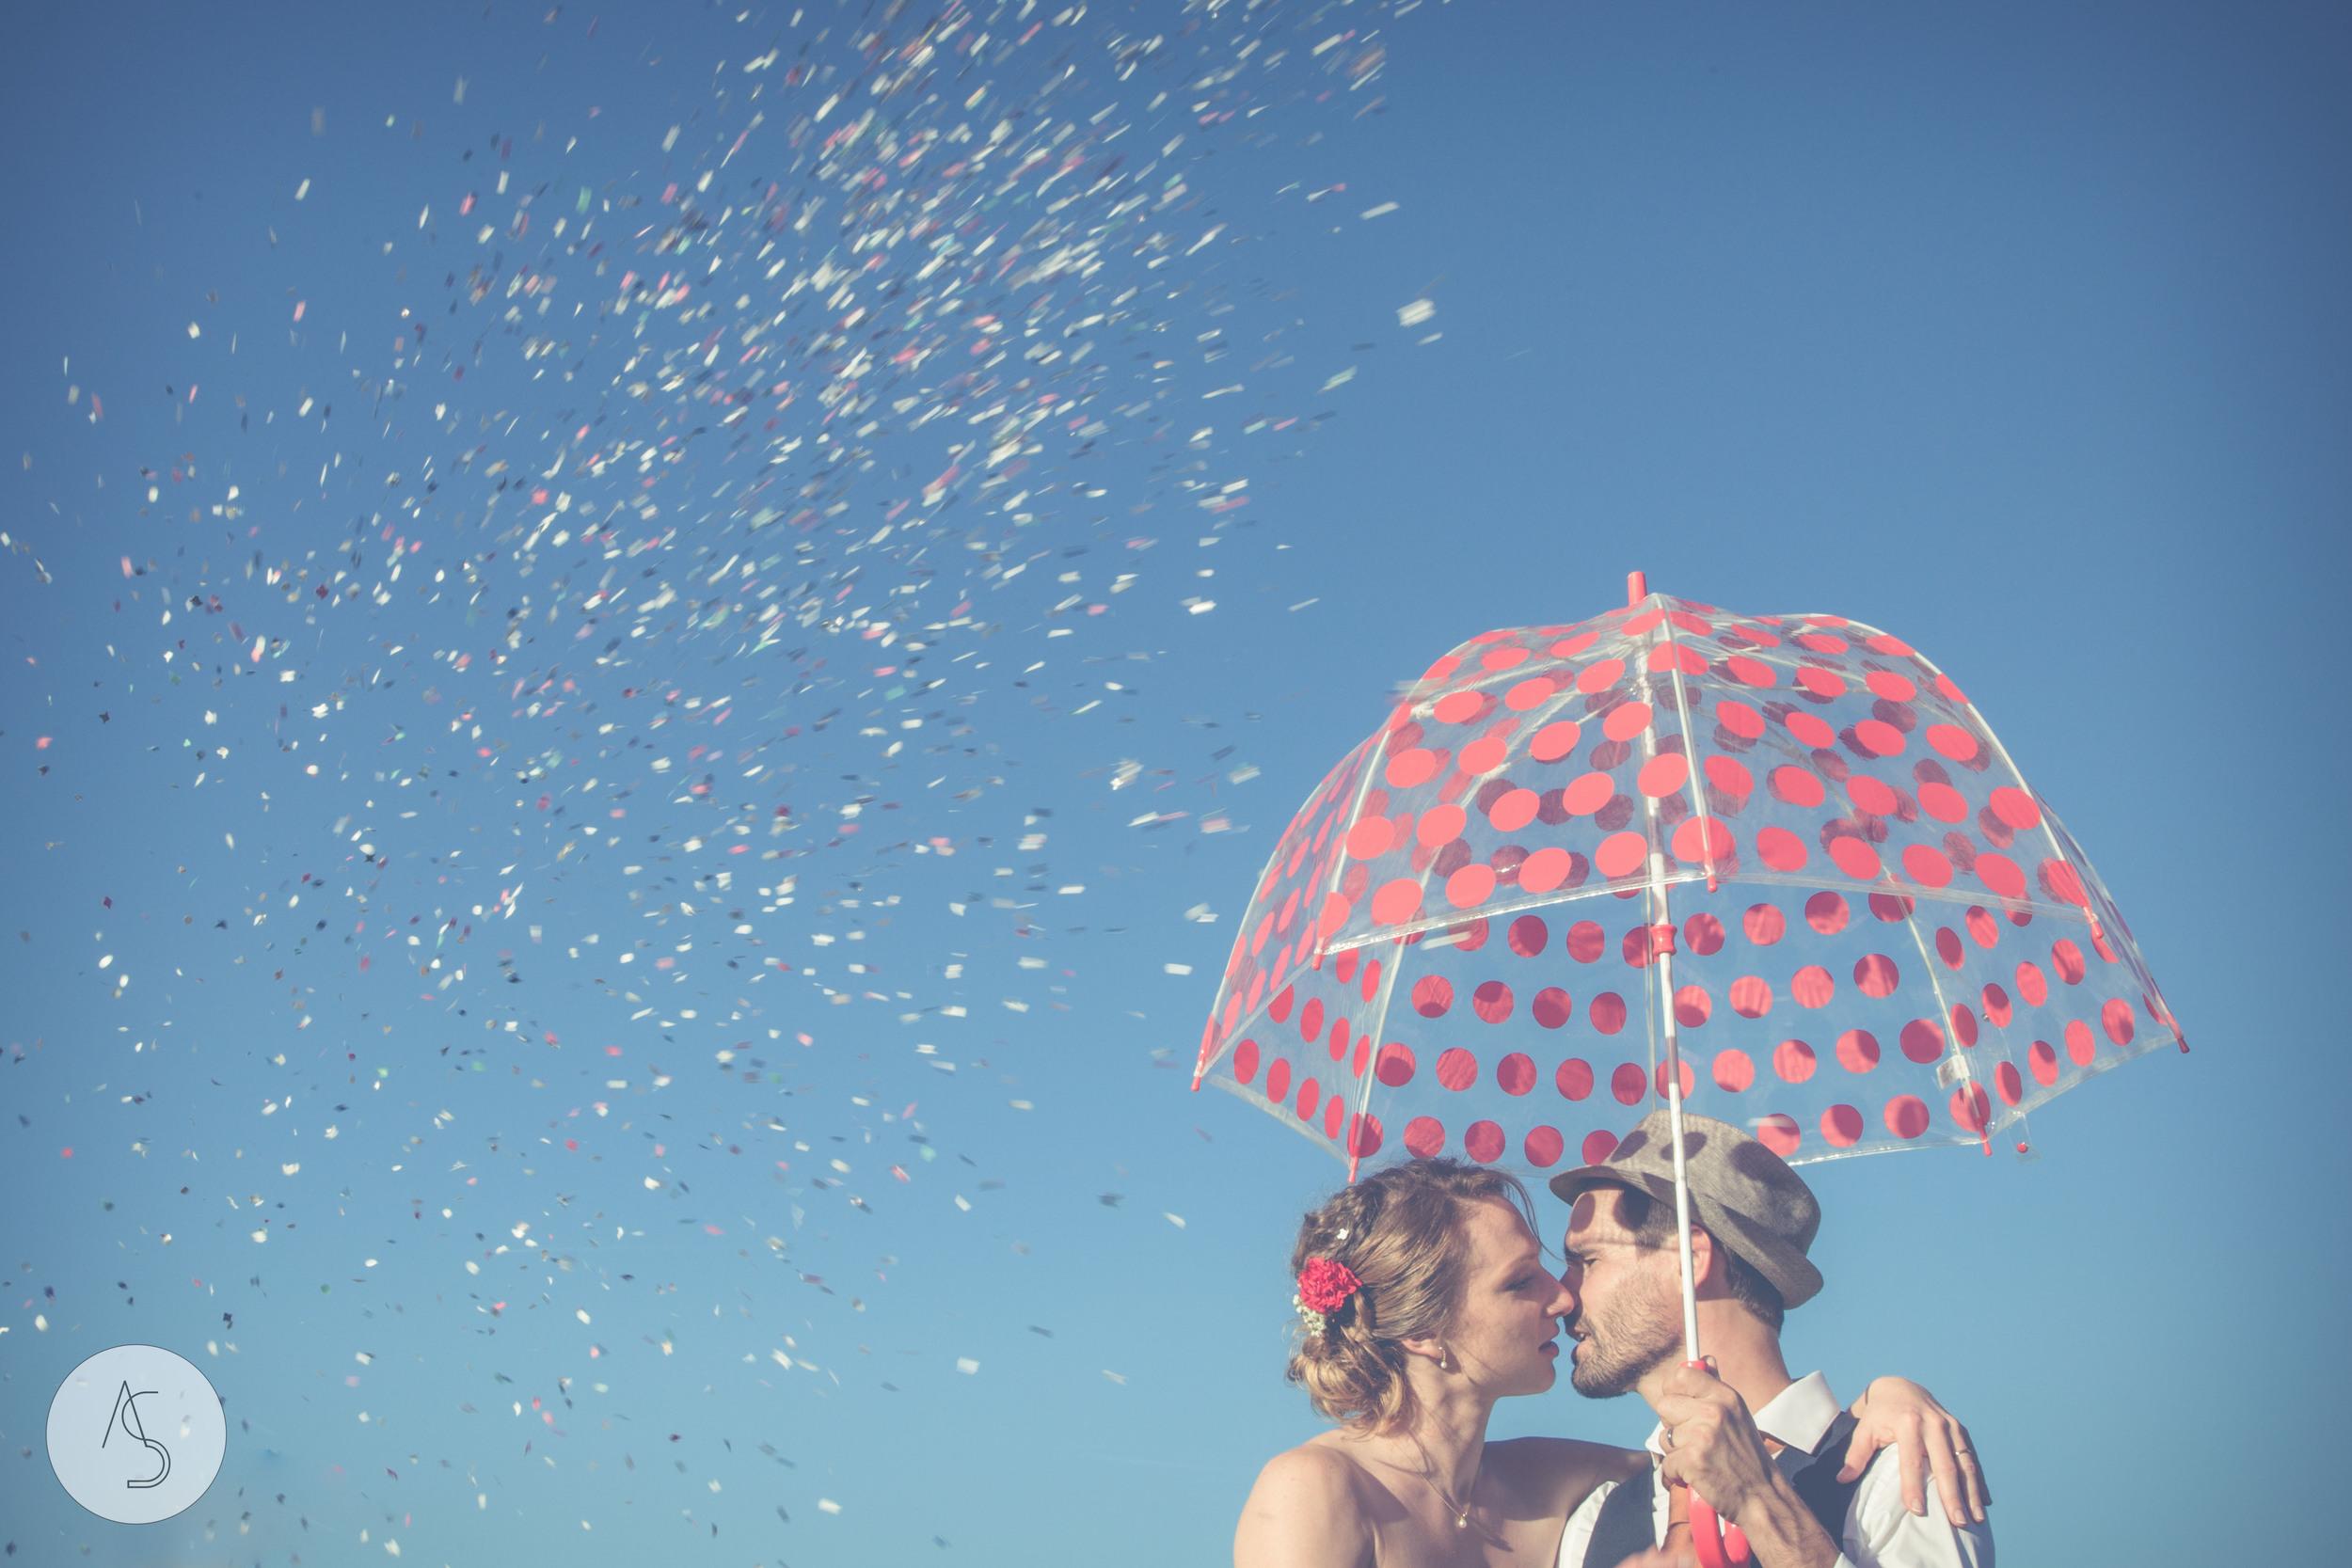 photographe mariage - Grenoble - Rhone Alpes - Adriana Salazar photo-107.jpg